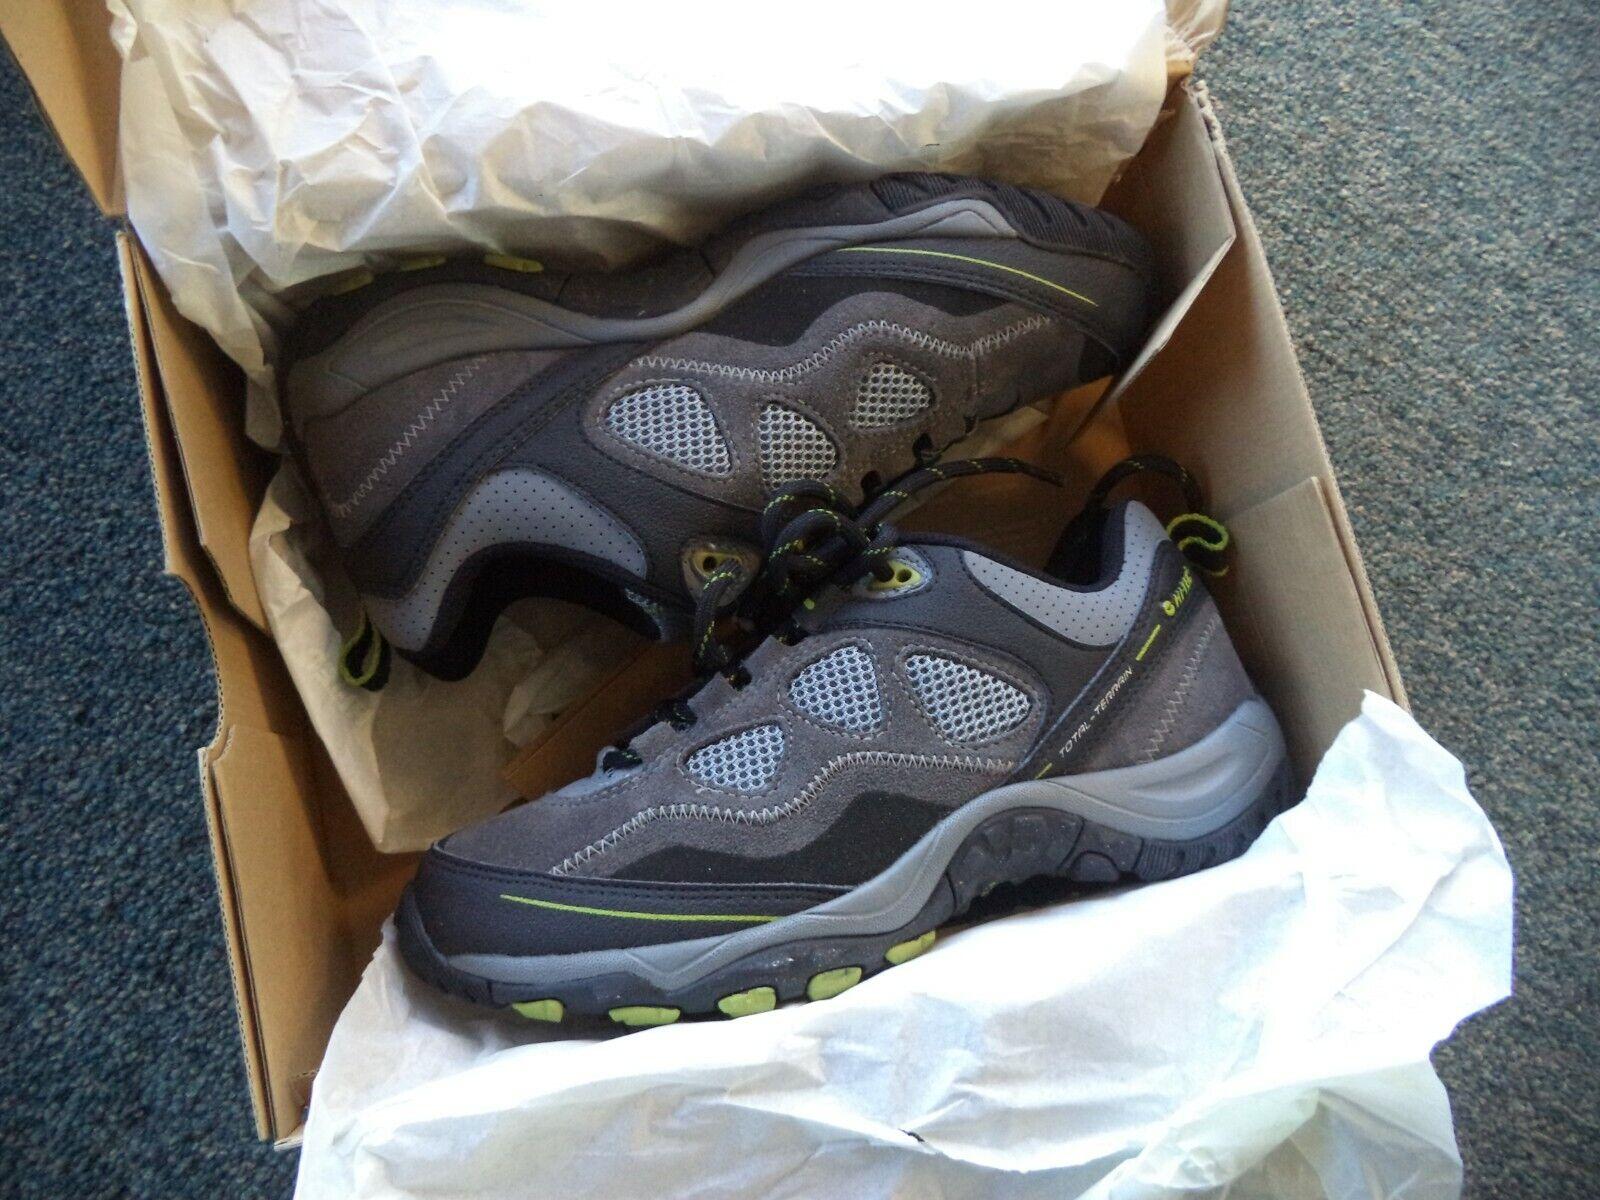 HI-TEC Total Terrain Sprint Gray Hiking Trail Men's Shoes Sz